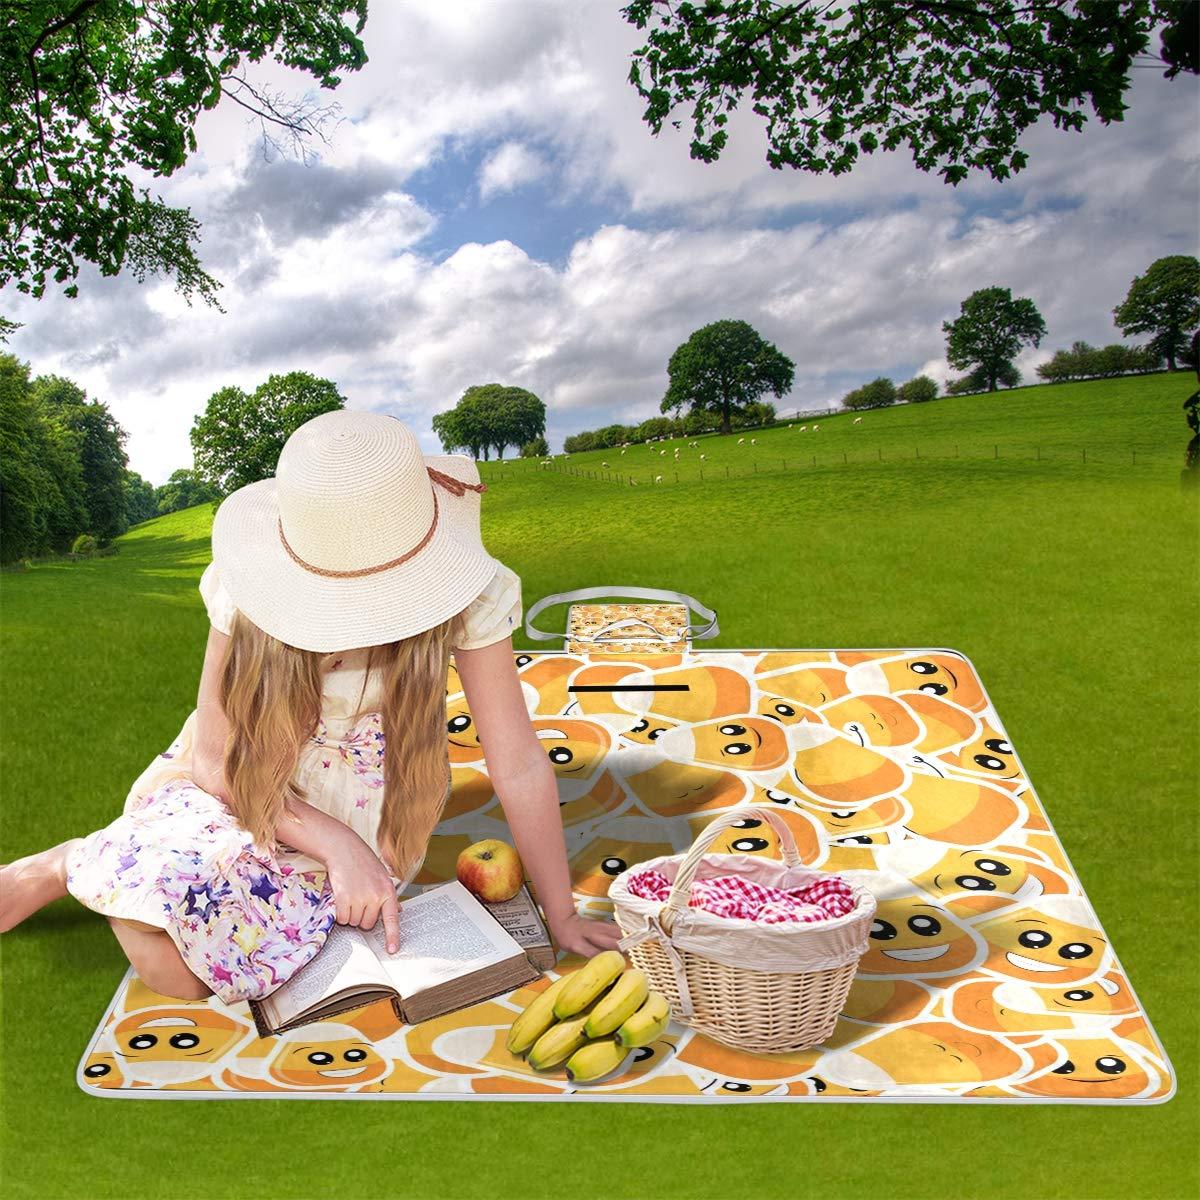 jeansame - Manta de pícnic, diseño de Emoticono de Calabaza Yoga, de Halloween, para Camping, Viajes, Senderismo, Yoga, Calabaza Impermeable, portátil, Plegable, 150 x 145 cm 3f5a5f